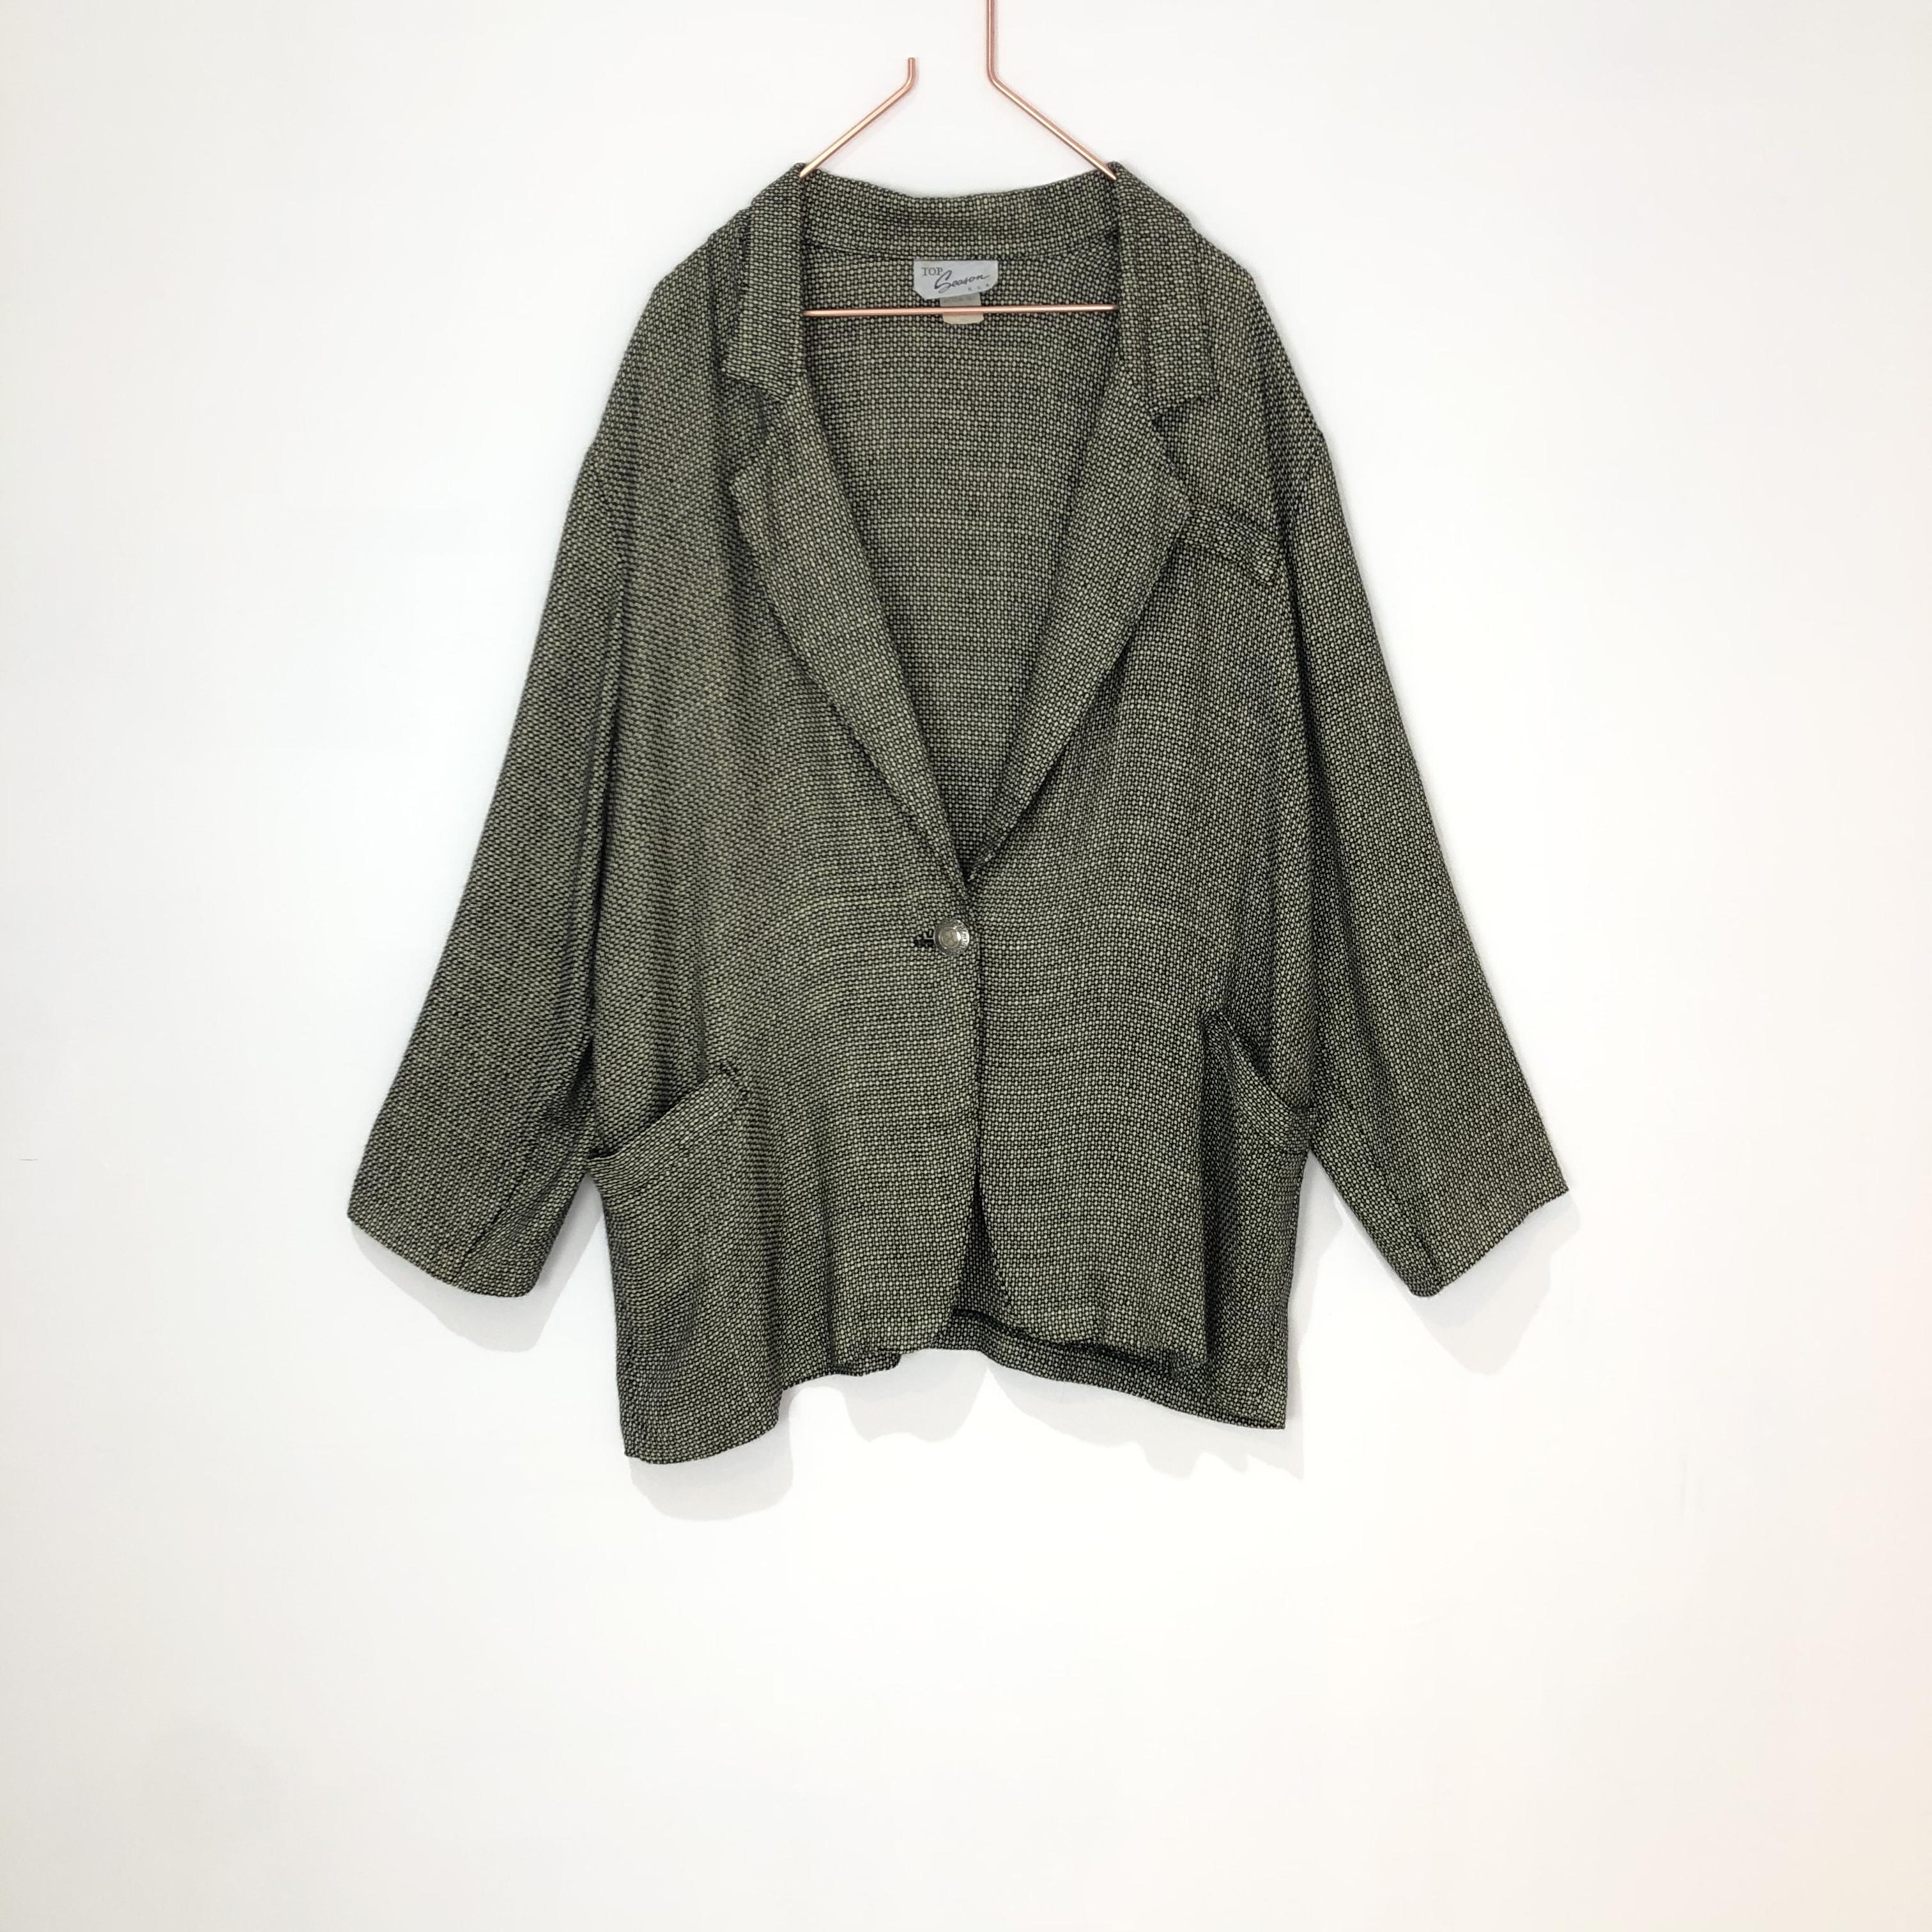 ◼︎80s vintage linen blend jacket from U.S.A.◼︎